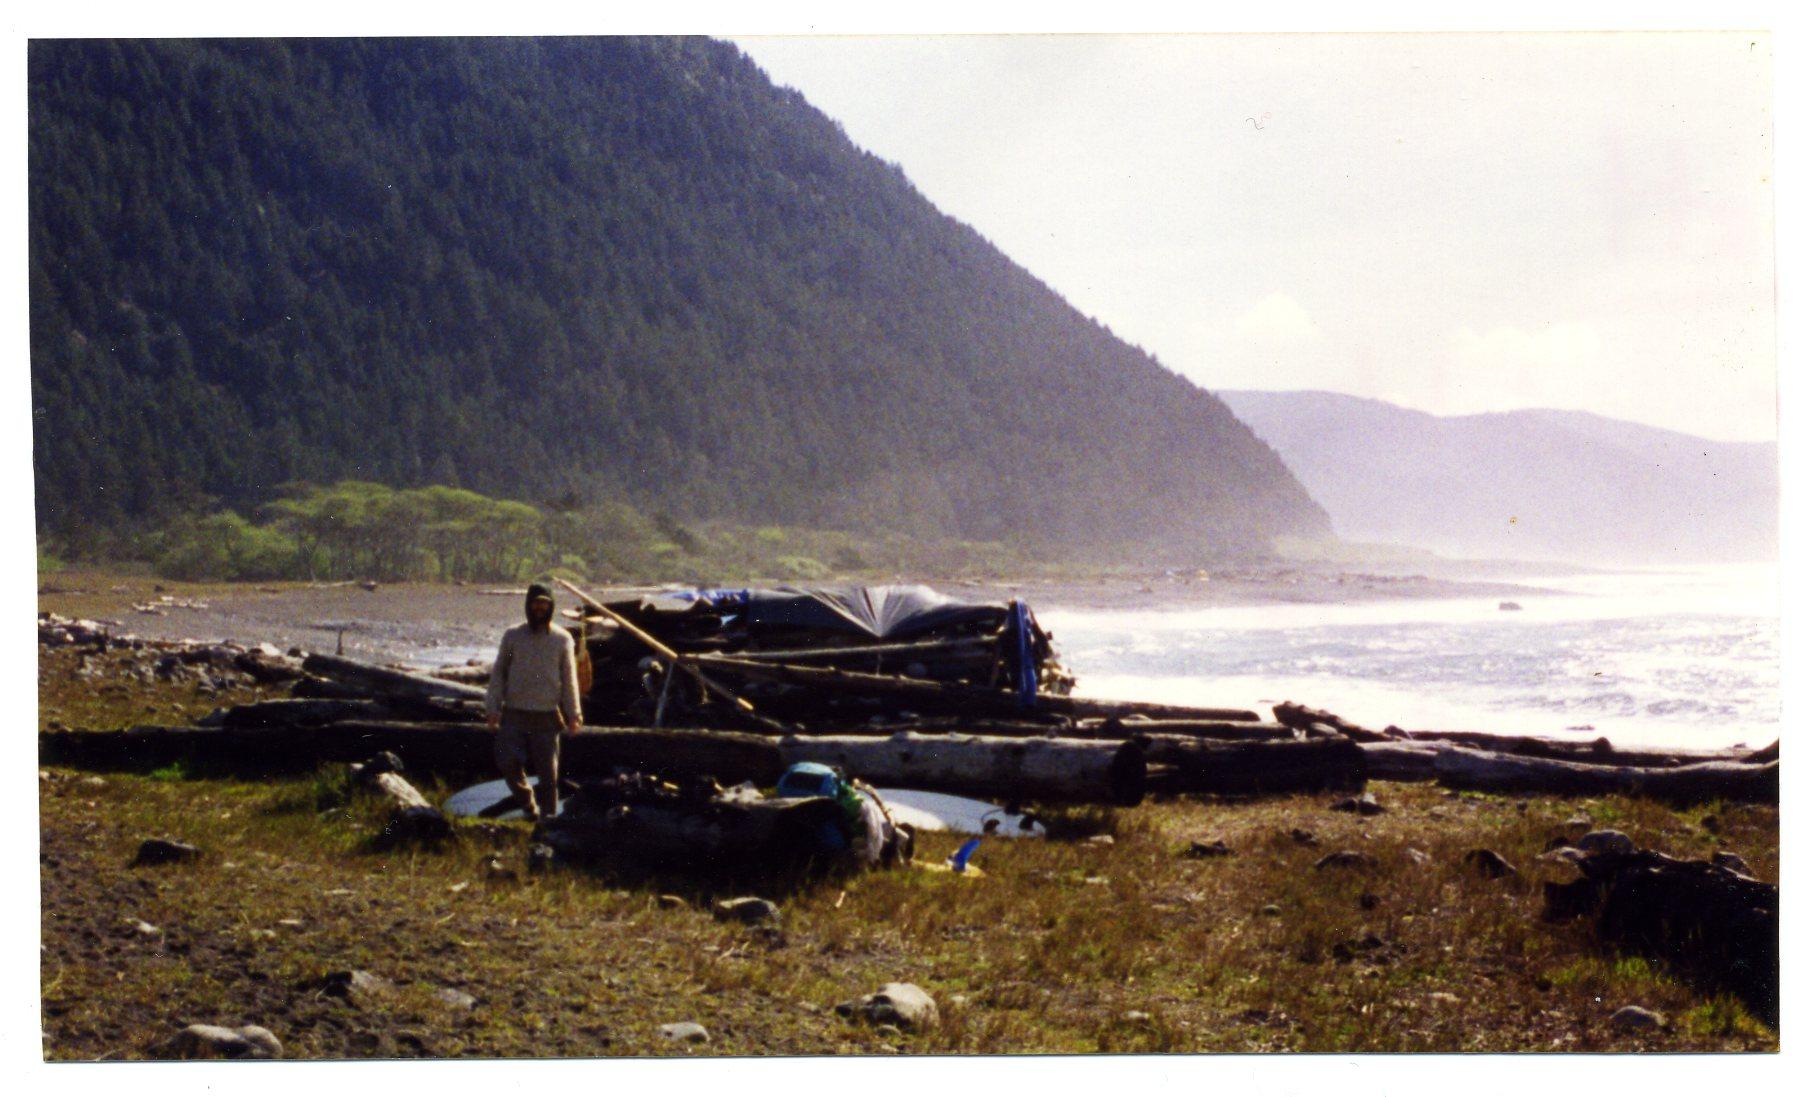 Artist Matt Beard emerging from a makeshift log shelter on the Lost Coast of Northern California circa 1996